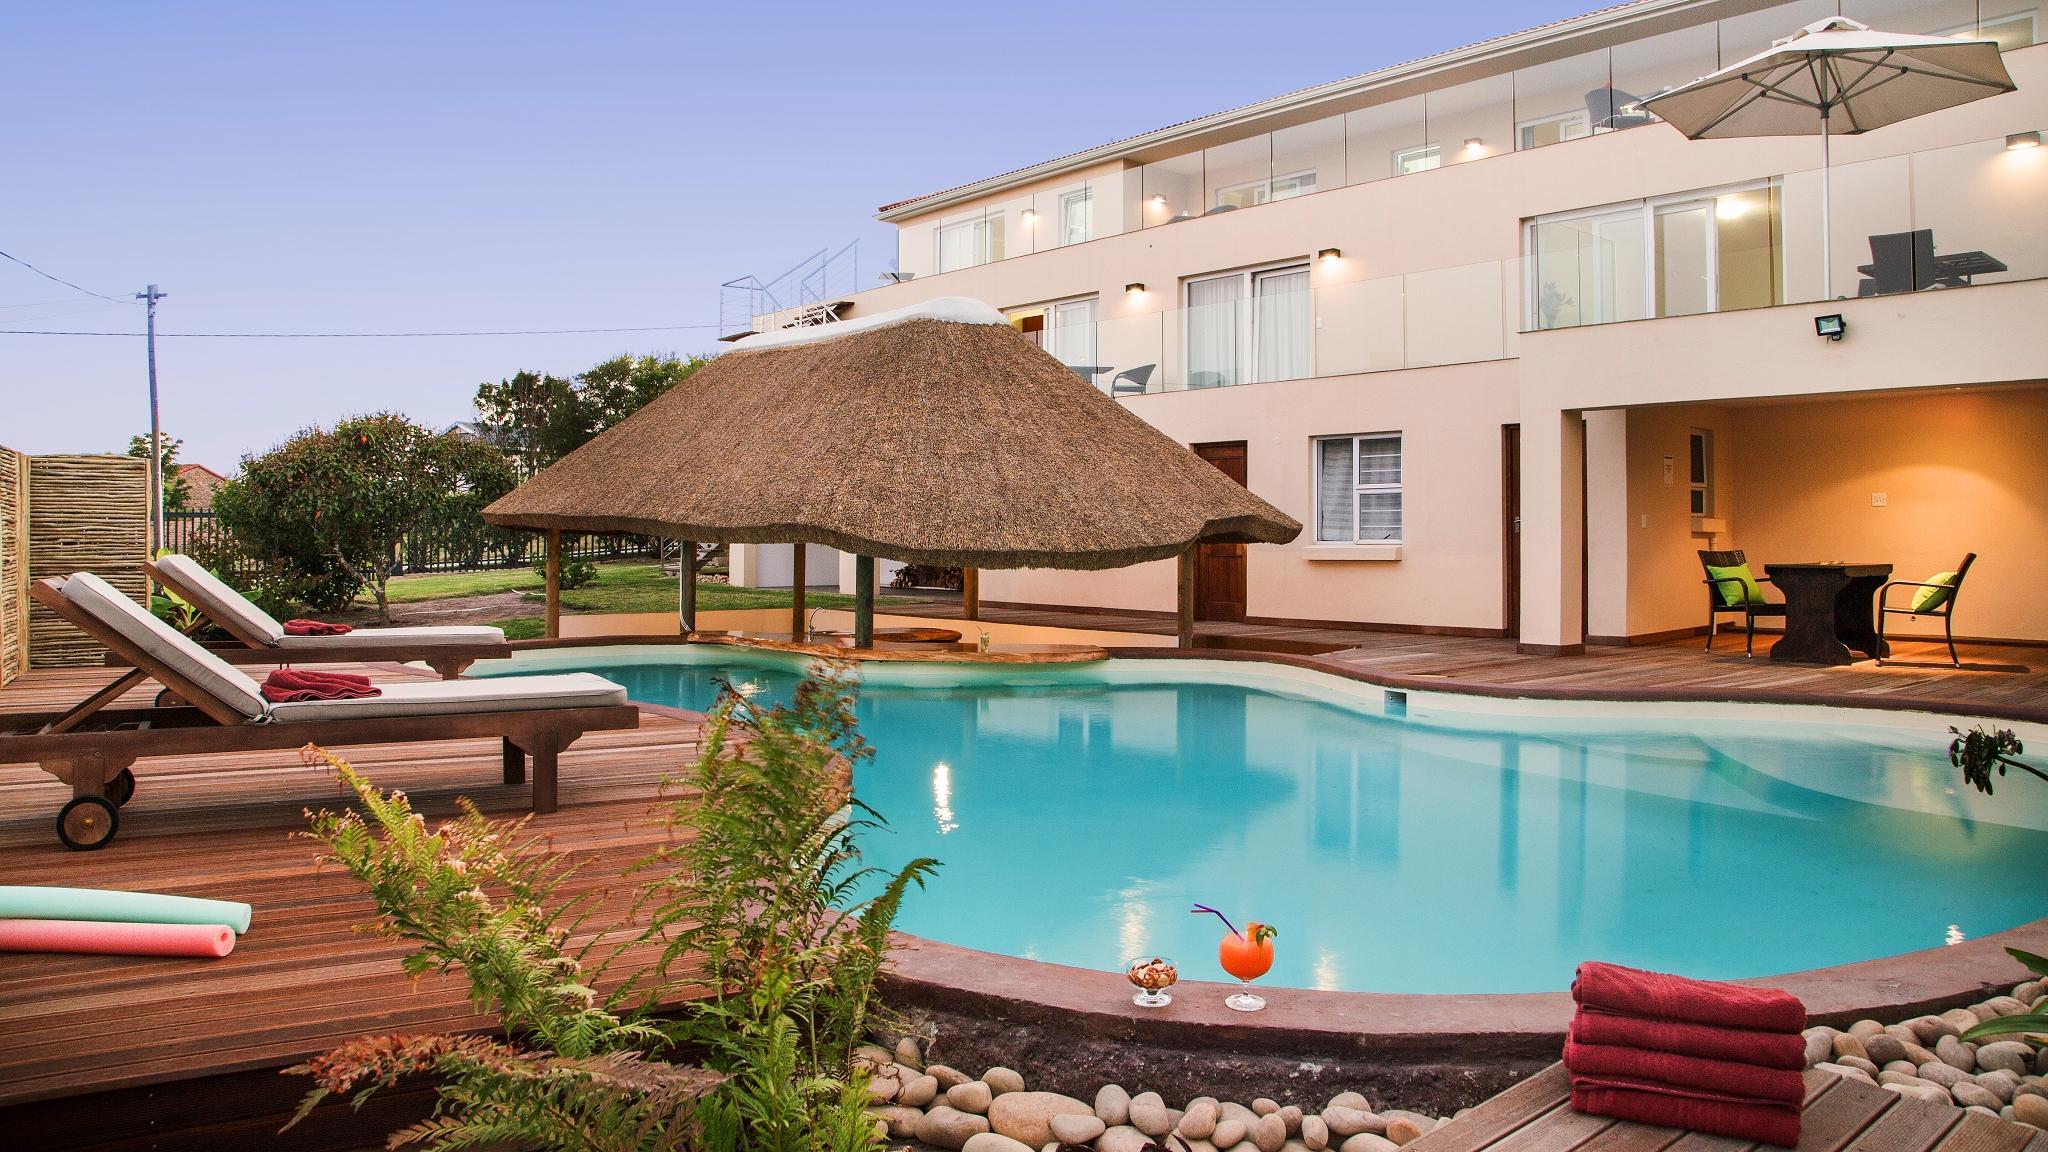 Lala Panzi Bb In Plettenberg Bay Room Deals Photos Reviews